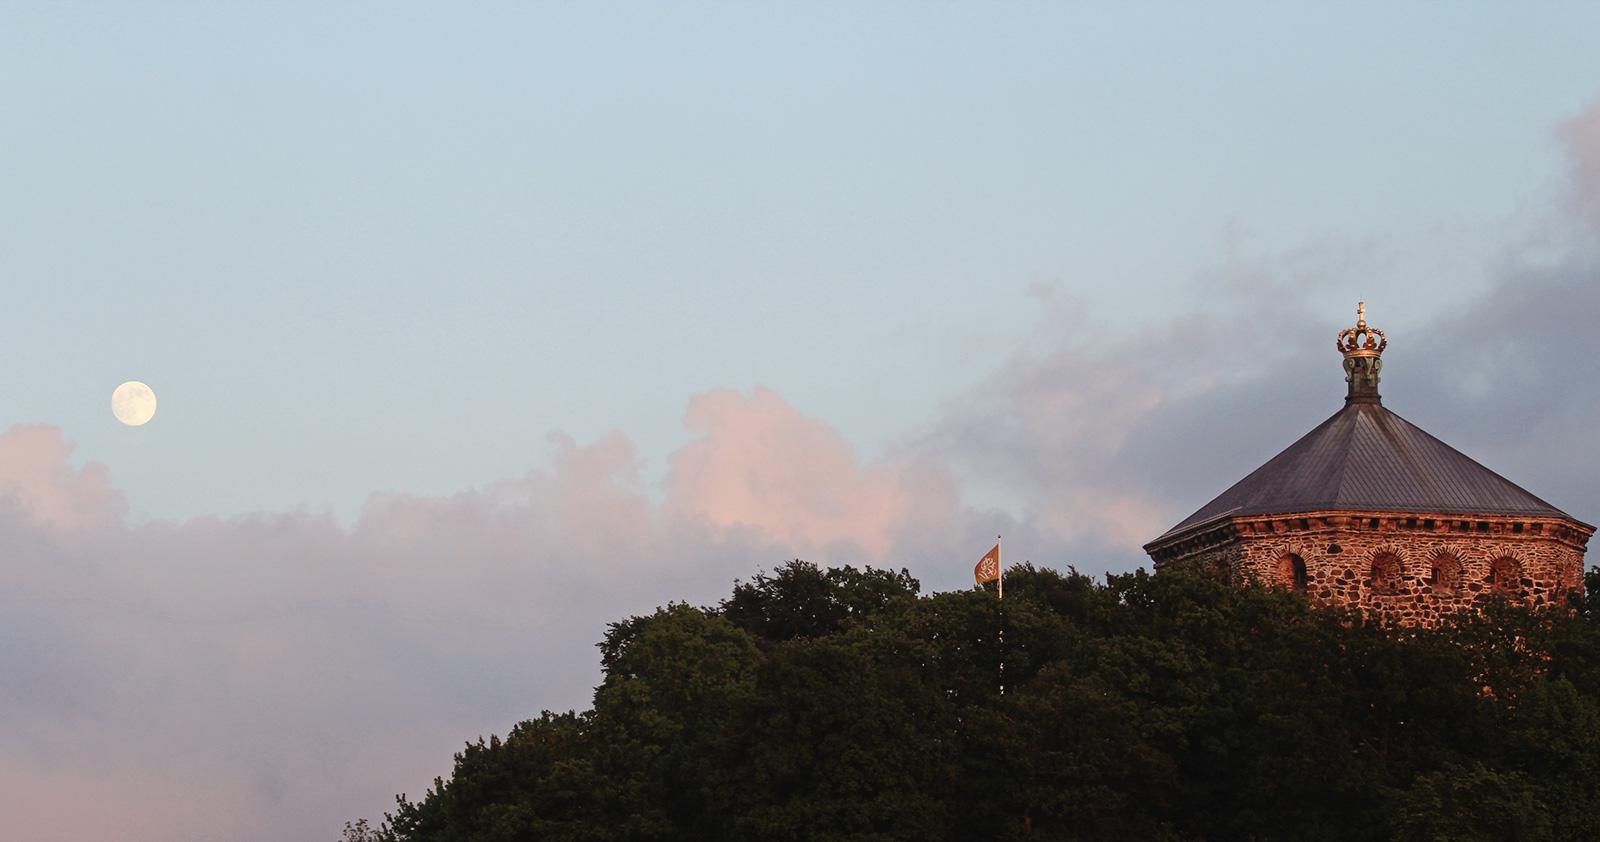 bland-molnen-11